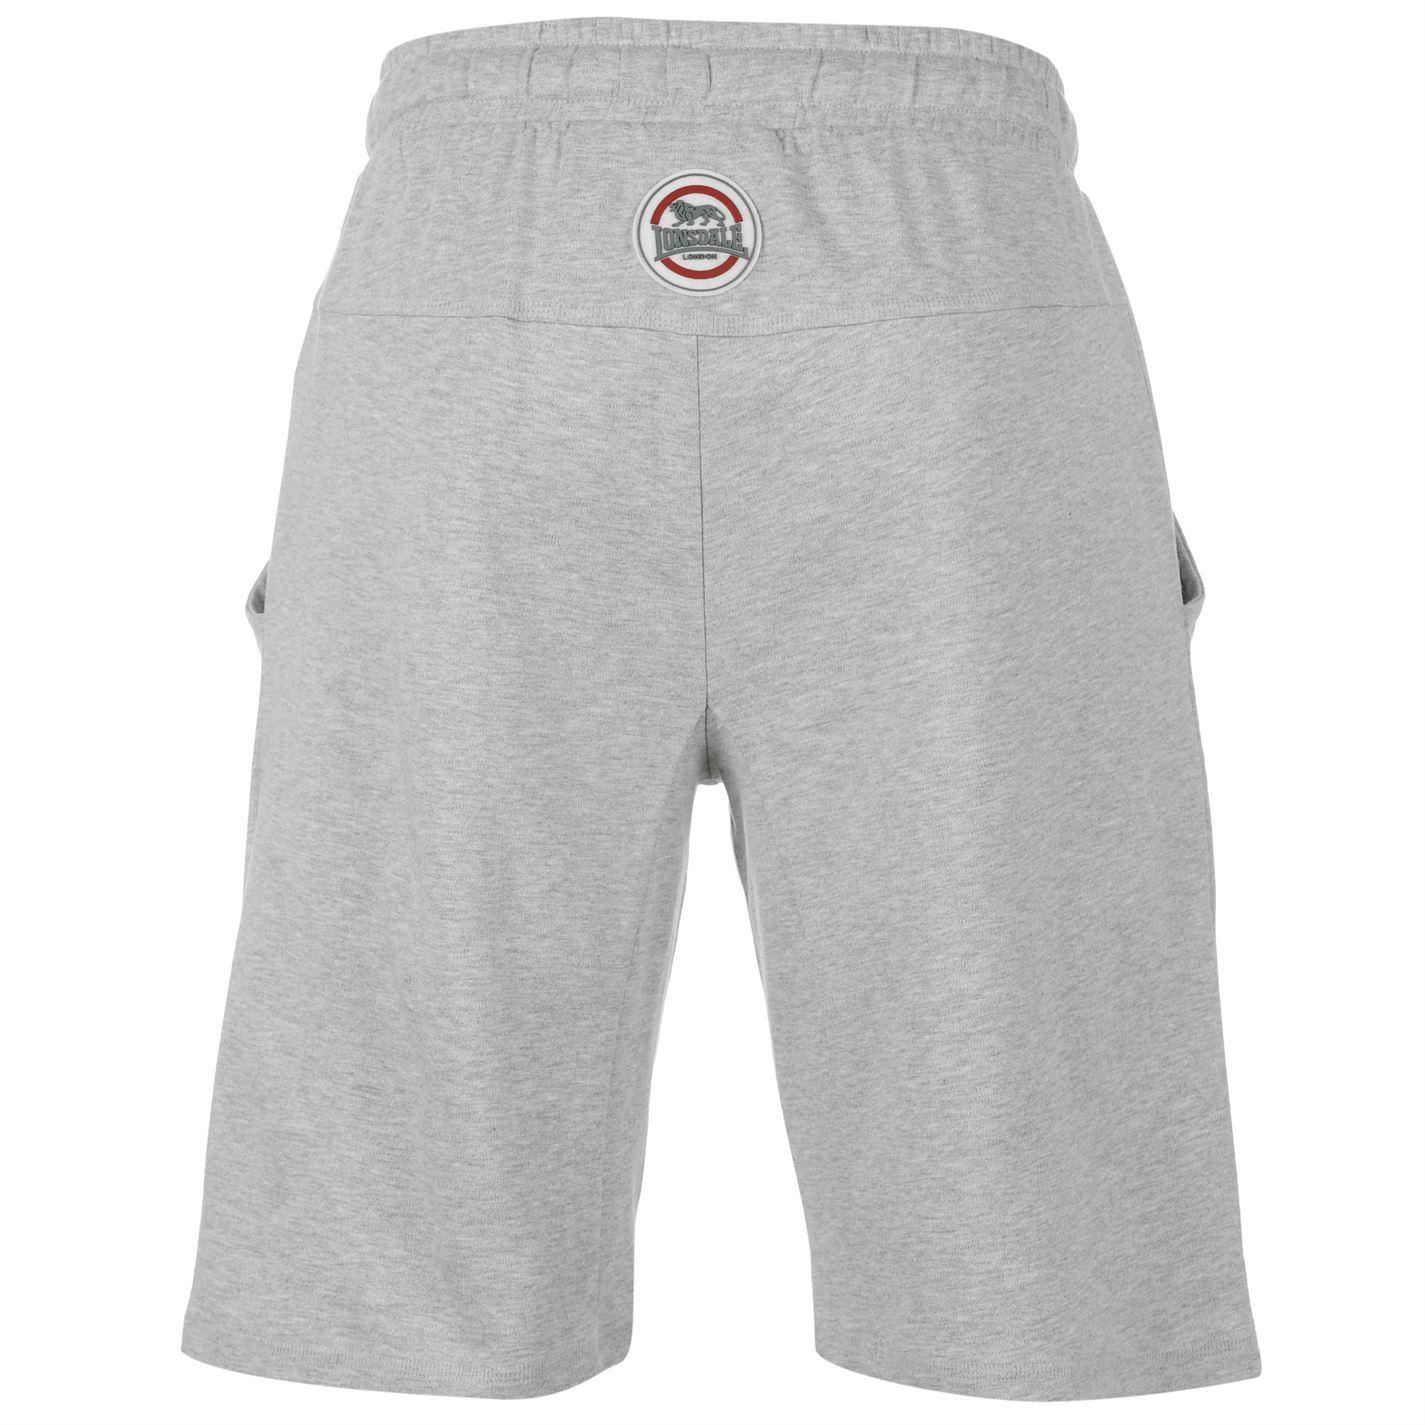 45664305c9 ... Lonsdale Lightweight Sweat Shorts Mens Grey Sportswear Short Boxing MMA